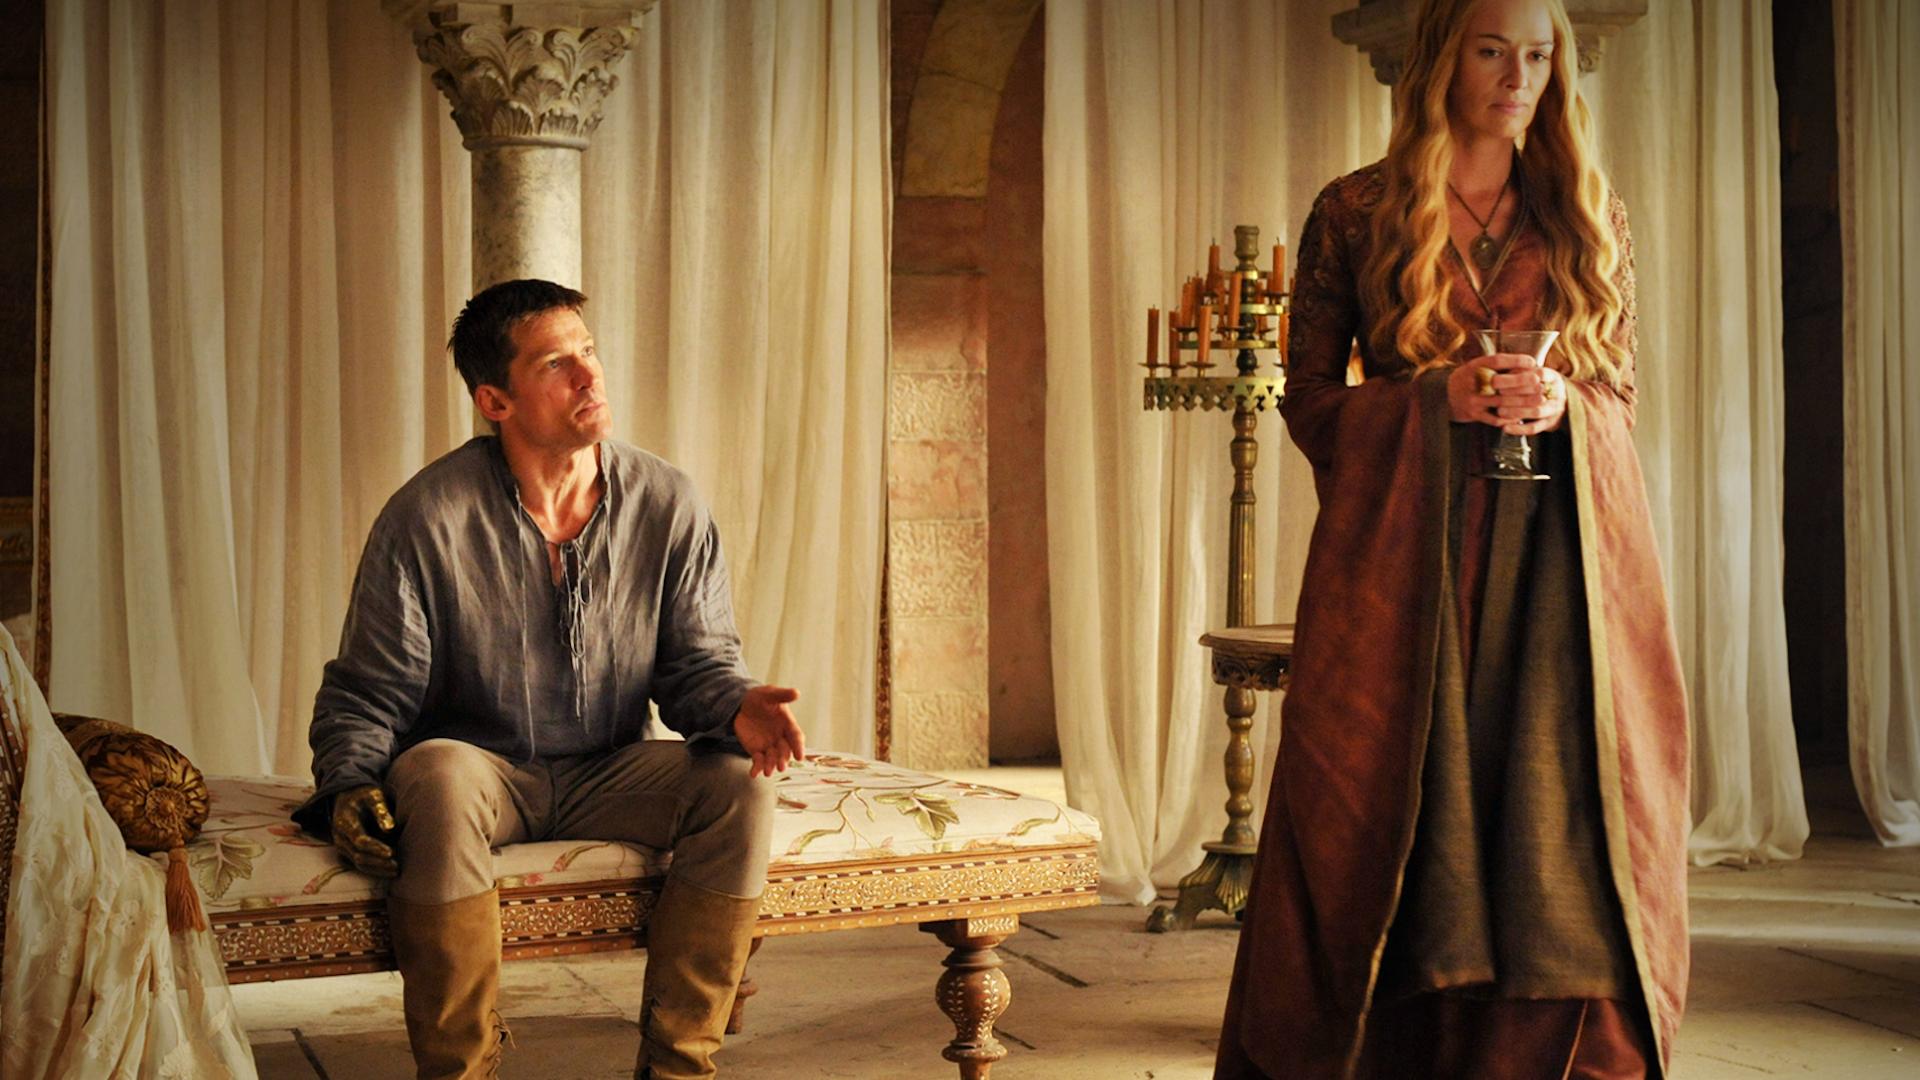 game-of-thrones-season-4-episode-1-jaime-and-cersei